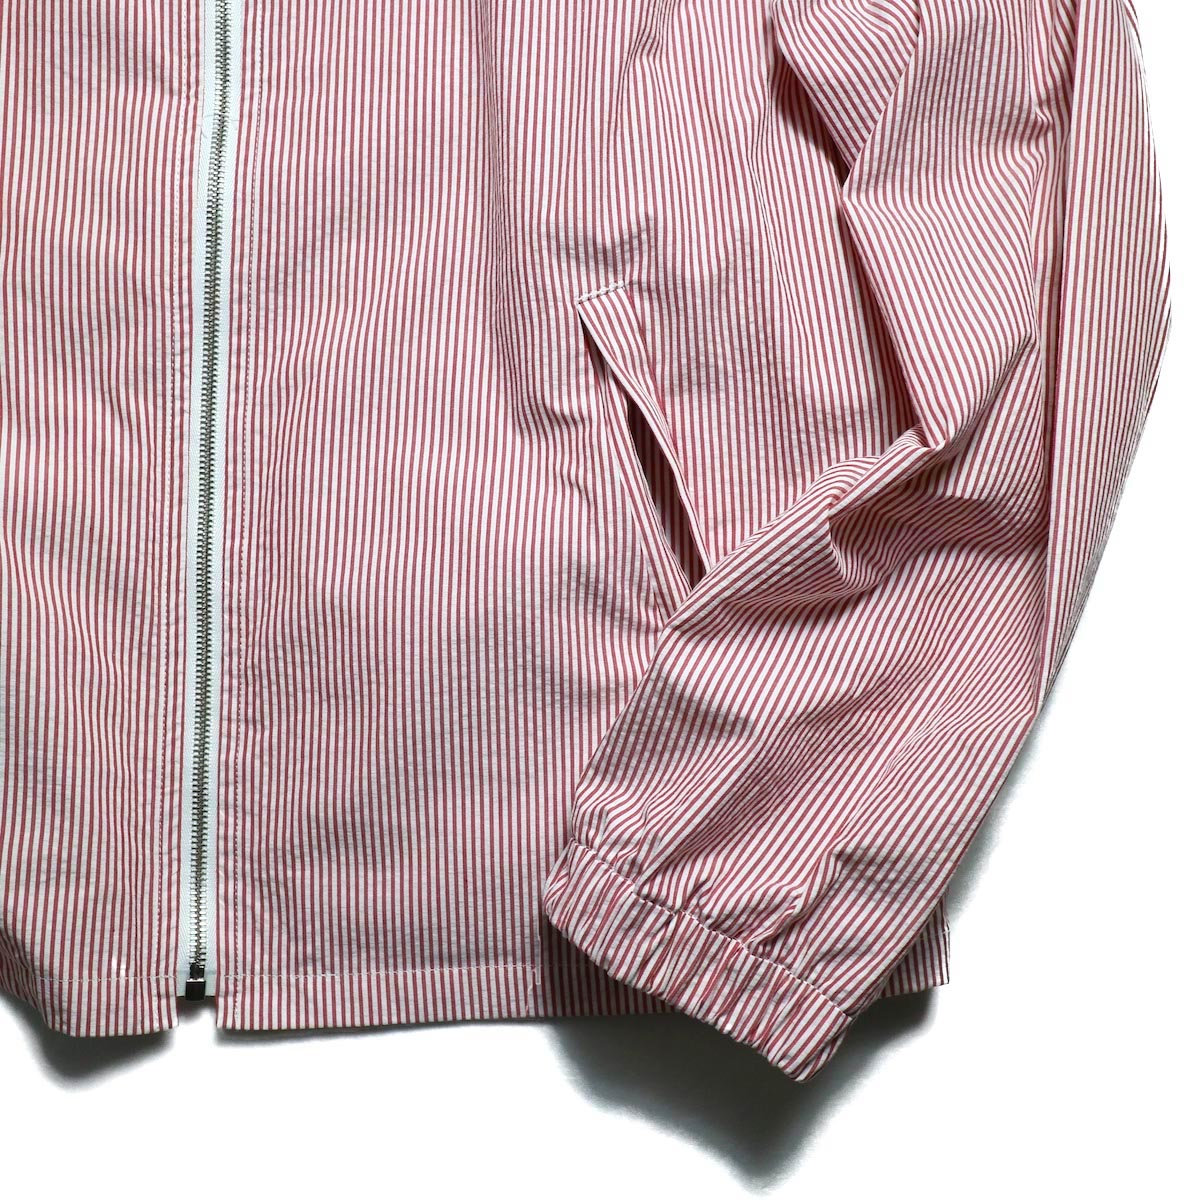 UNUSED / US1564 Stripe Drizzler Jacket. (Red × White) 袖、裾